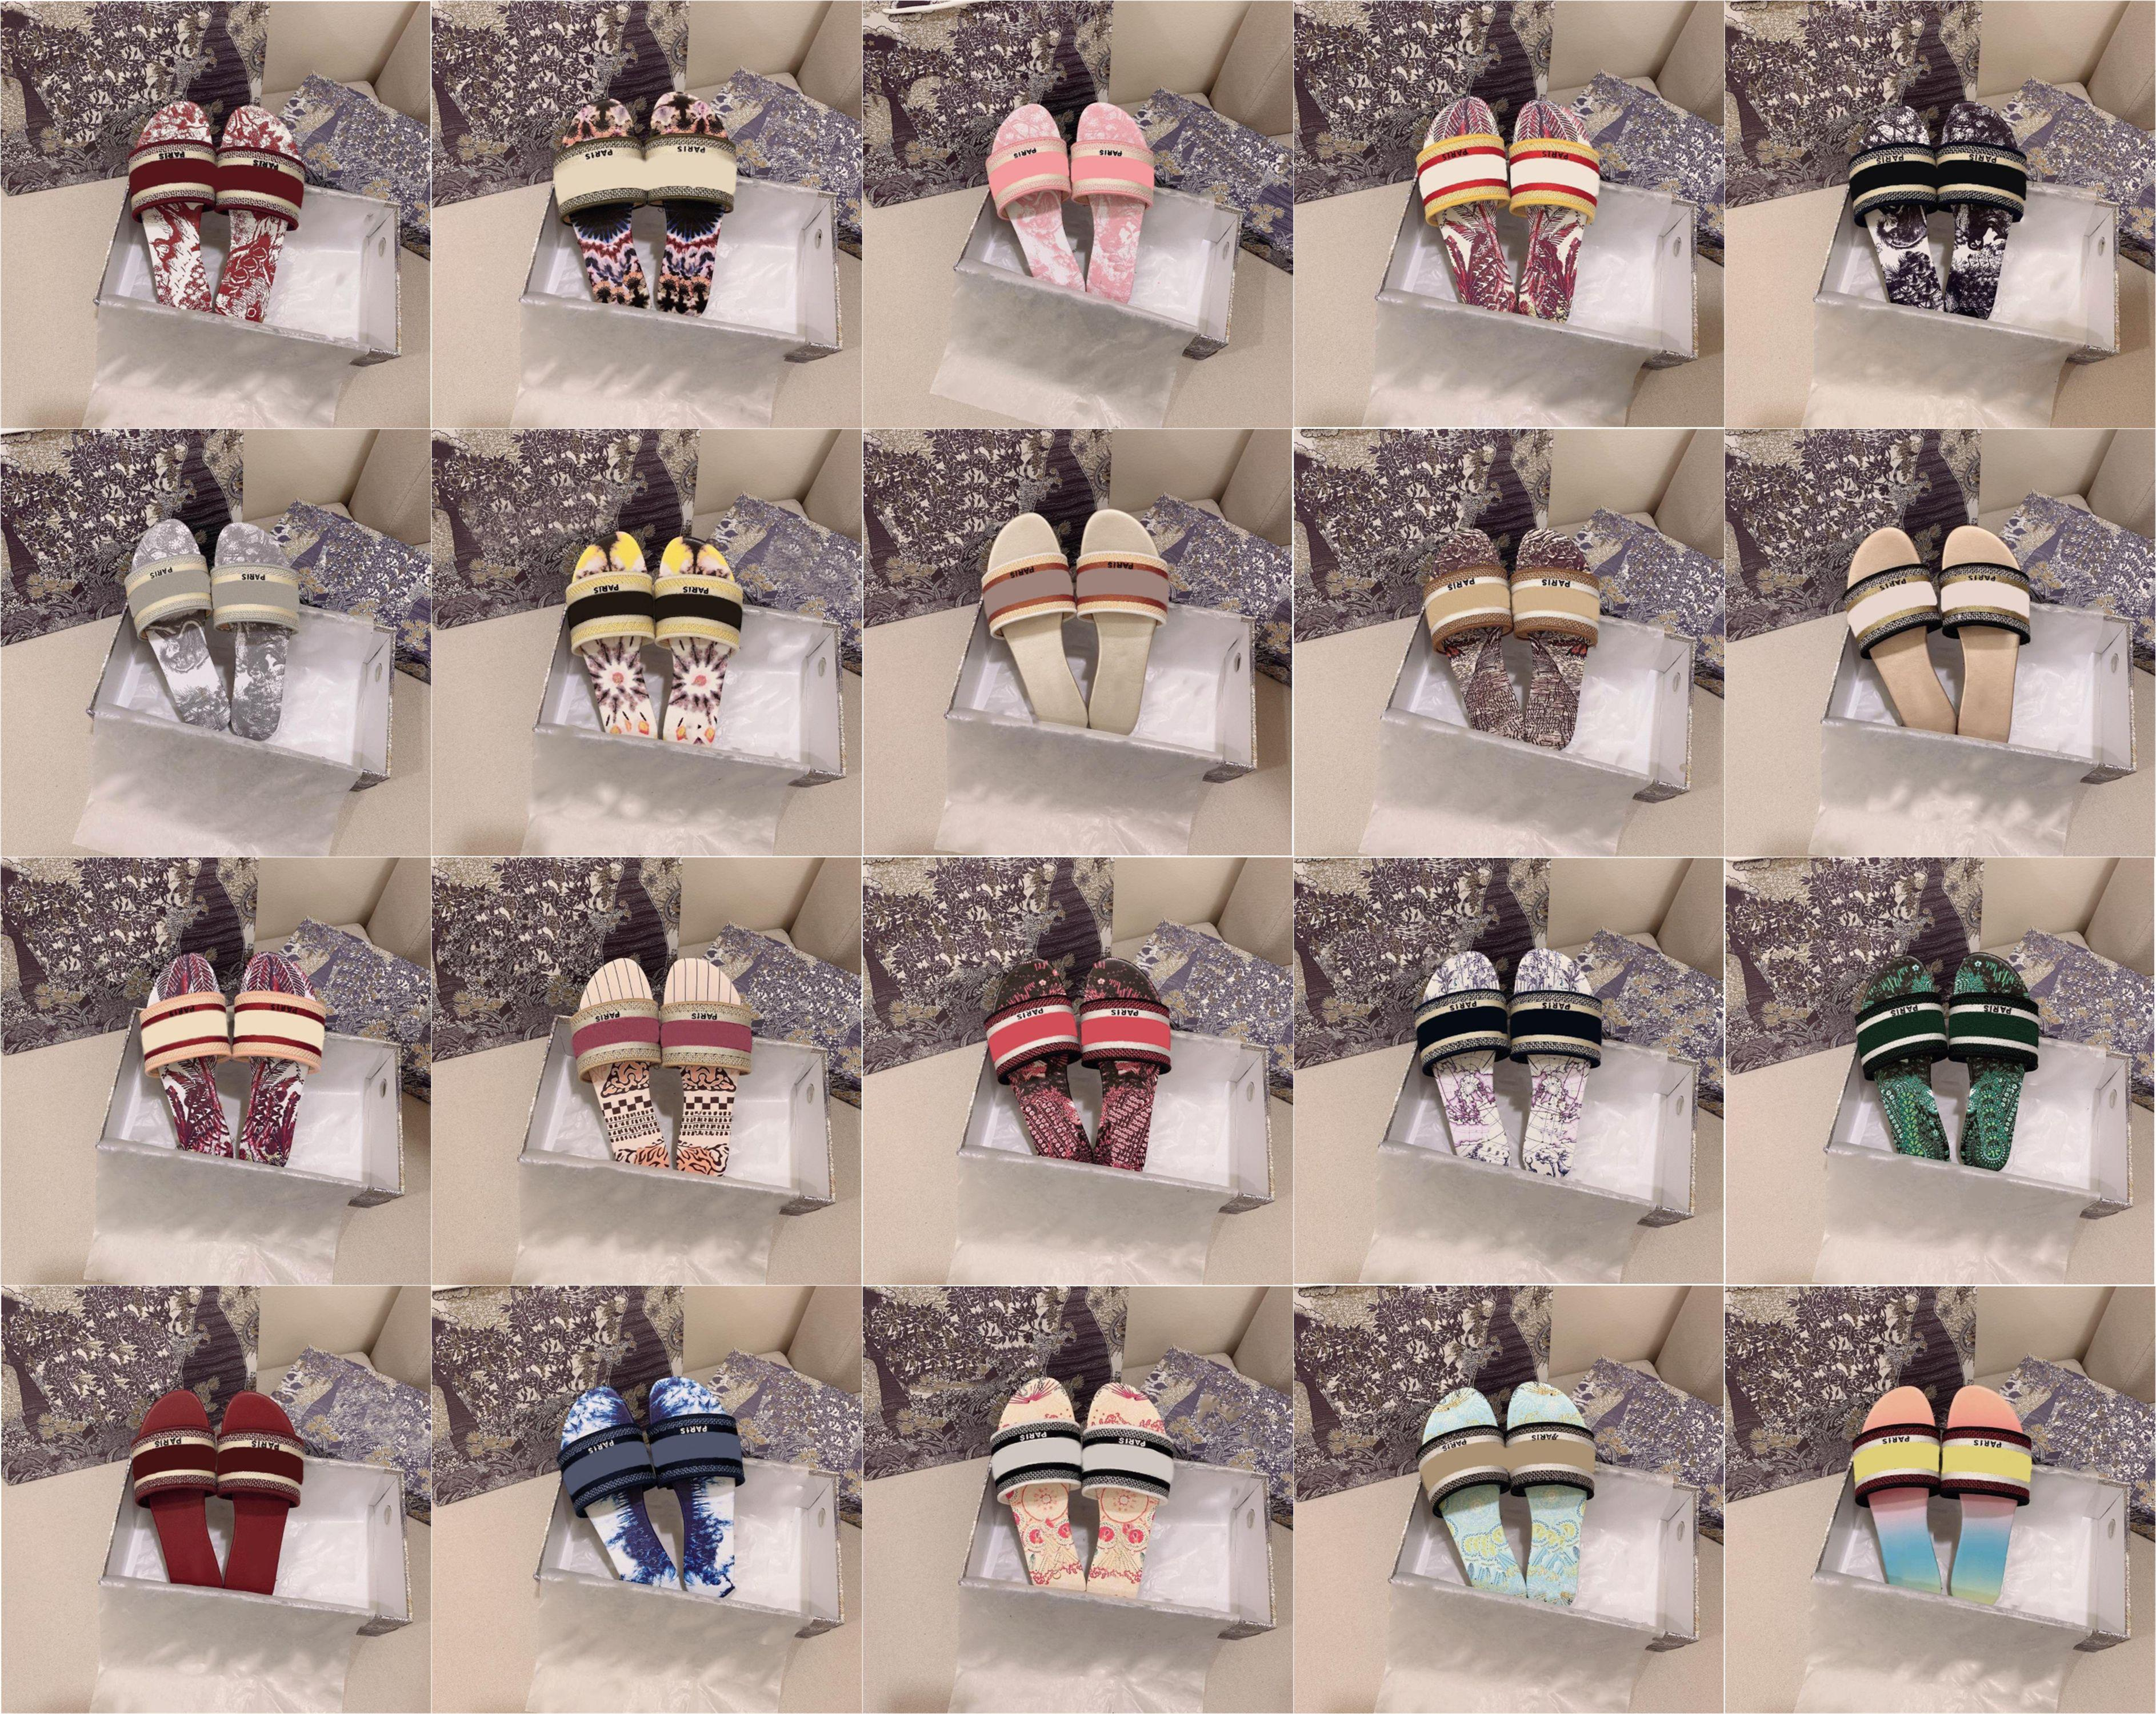 2021 Luxurys Designers Slides leather sandals summer flat shoes fashion Beach Women's big rainbow letter slippers